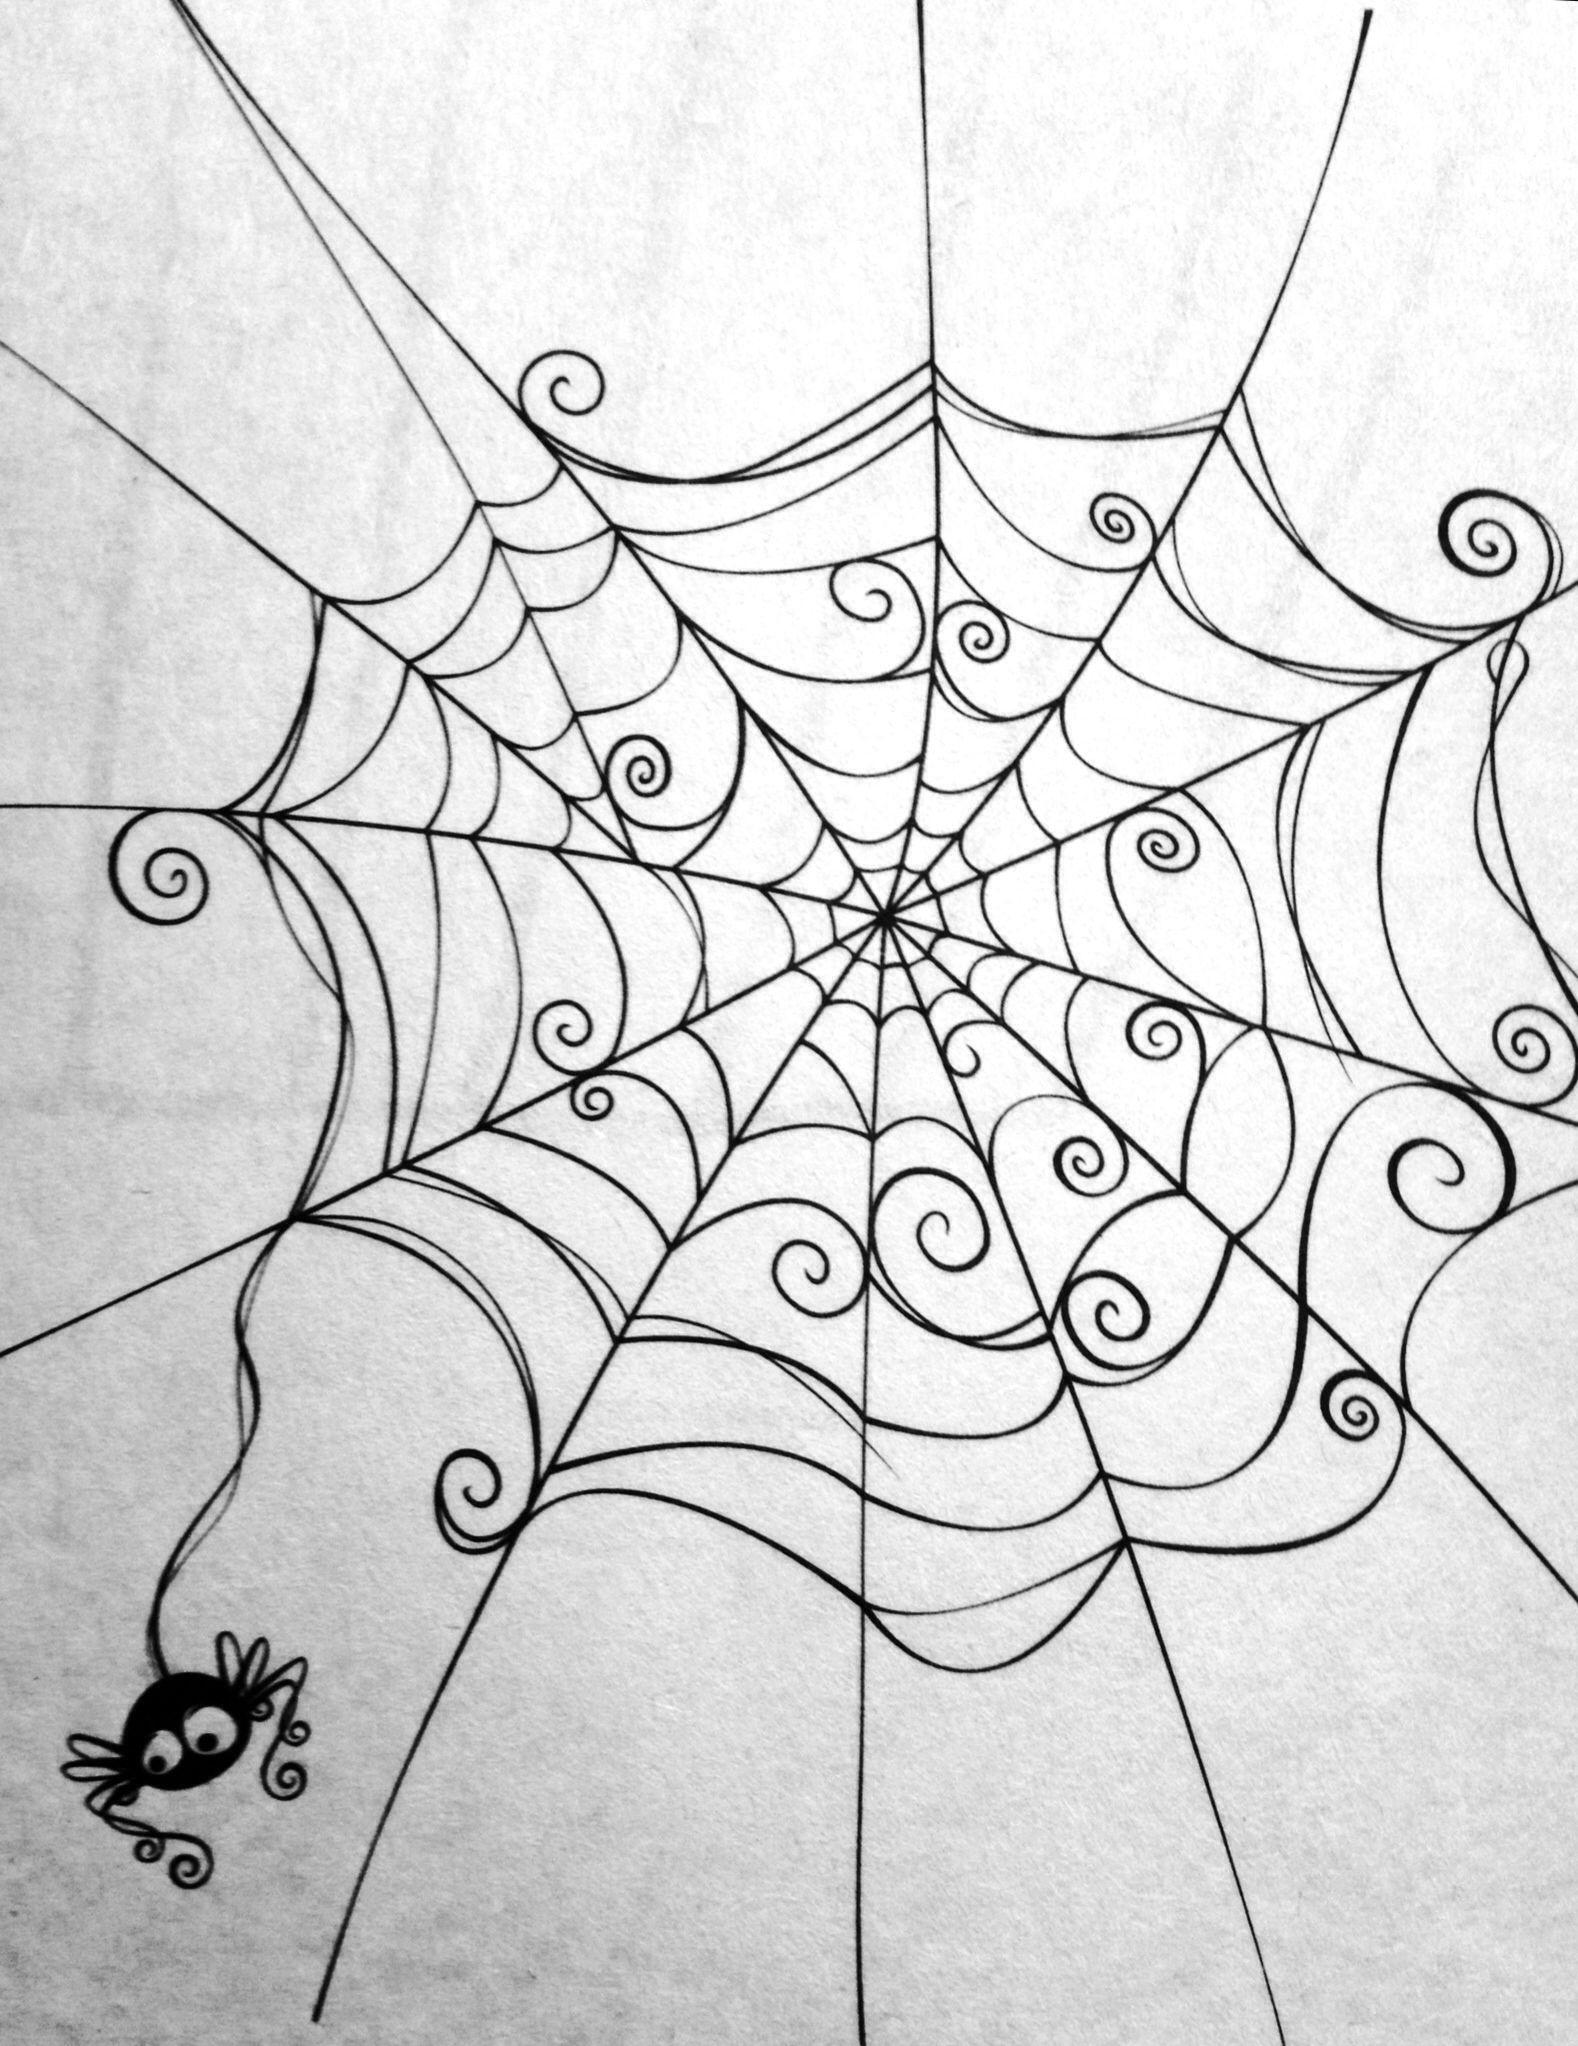 Spider Web. Cute Spider. | Toile D Araignée Dessin, Dessin avec Toile D Araignée Dessin